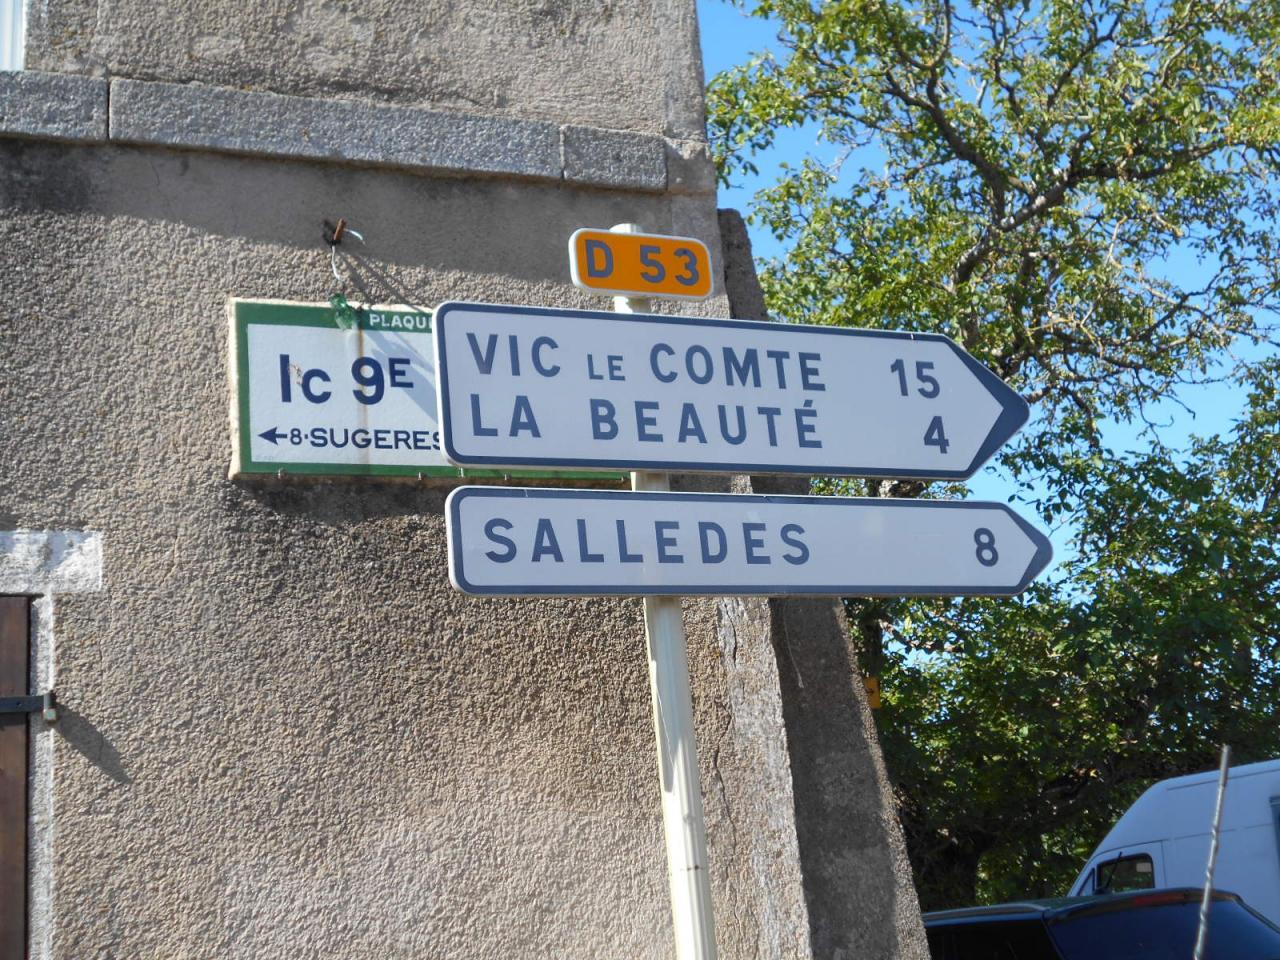 63270 Isserteaux (3)